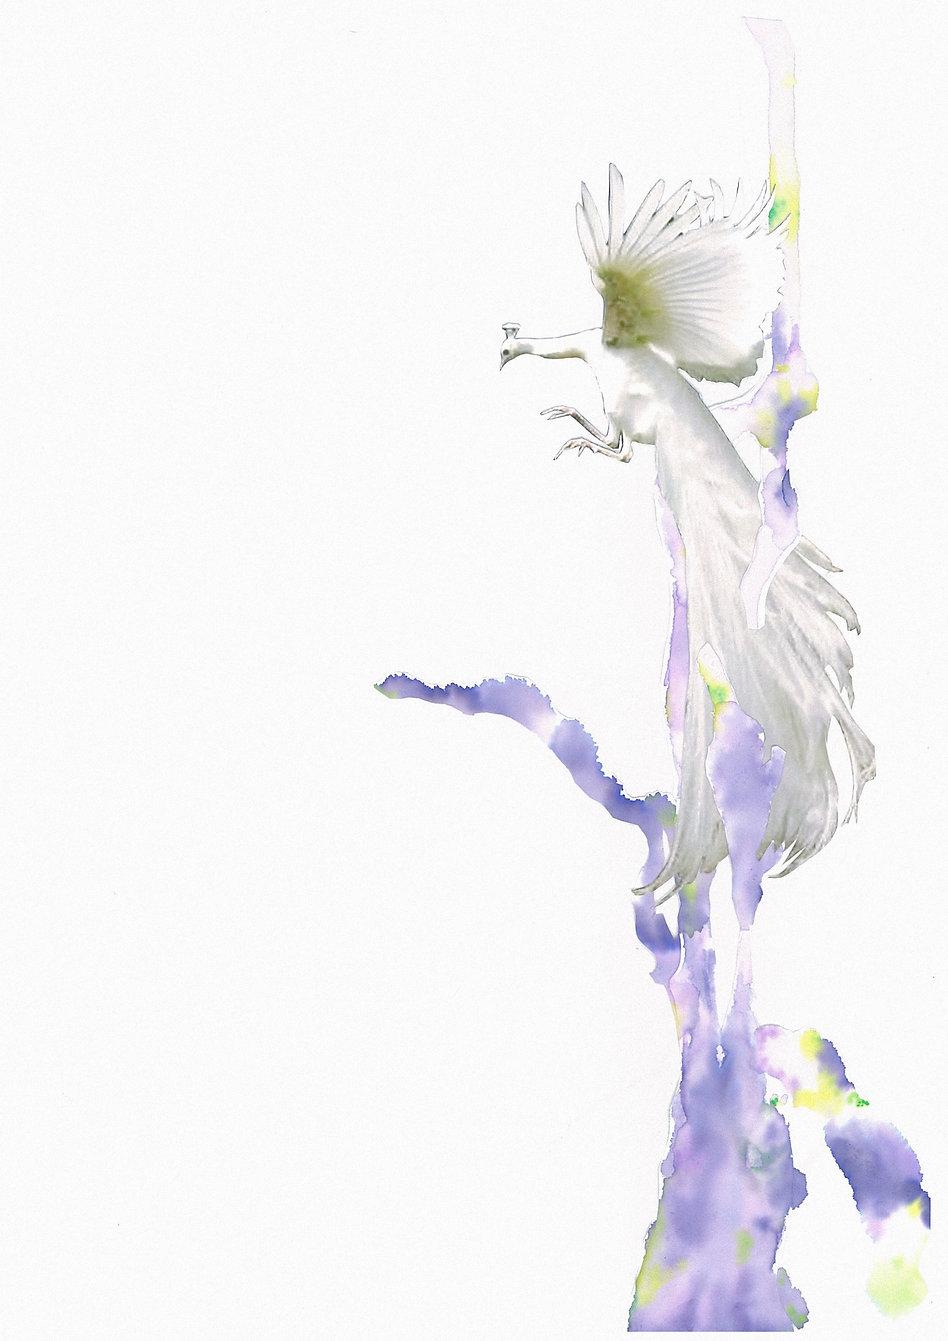 scan-001-2_edited_edited.jpg